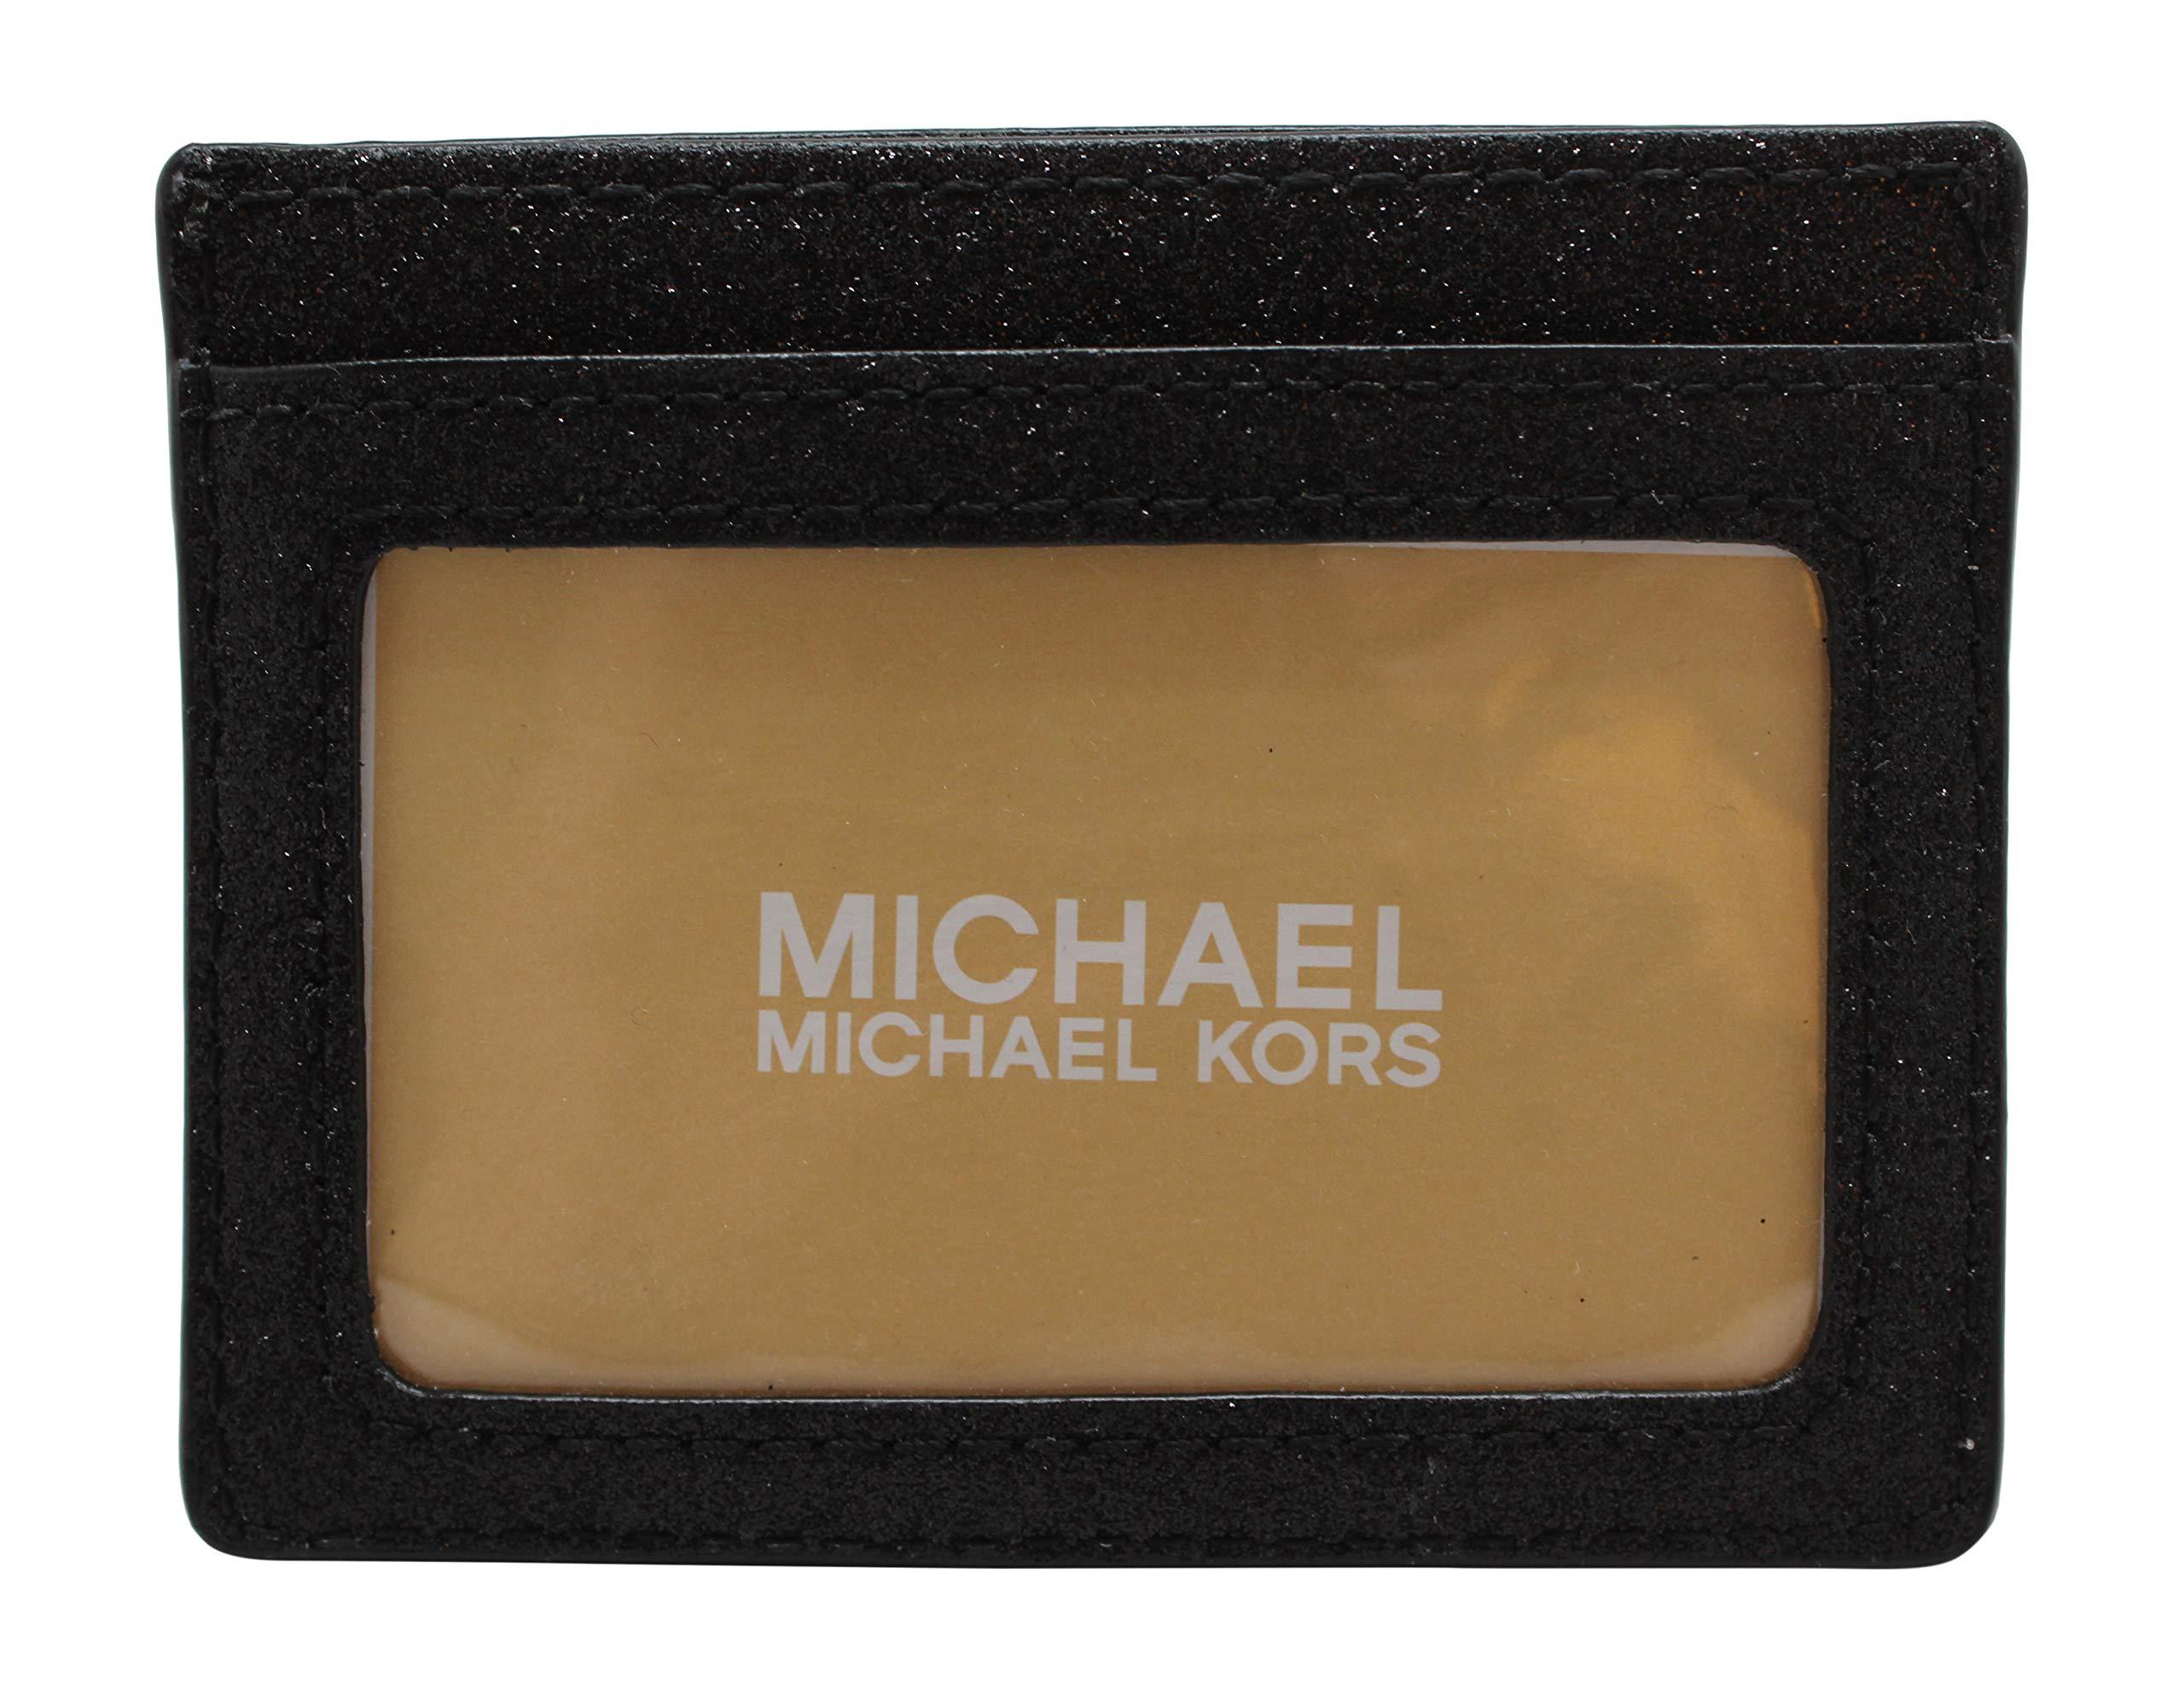 Michael Kors Giftables Large Card Holder Black Glitter by Michael Kors (Image #2)